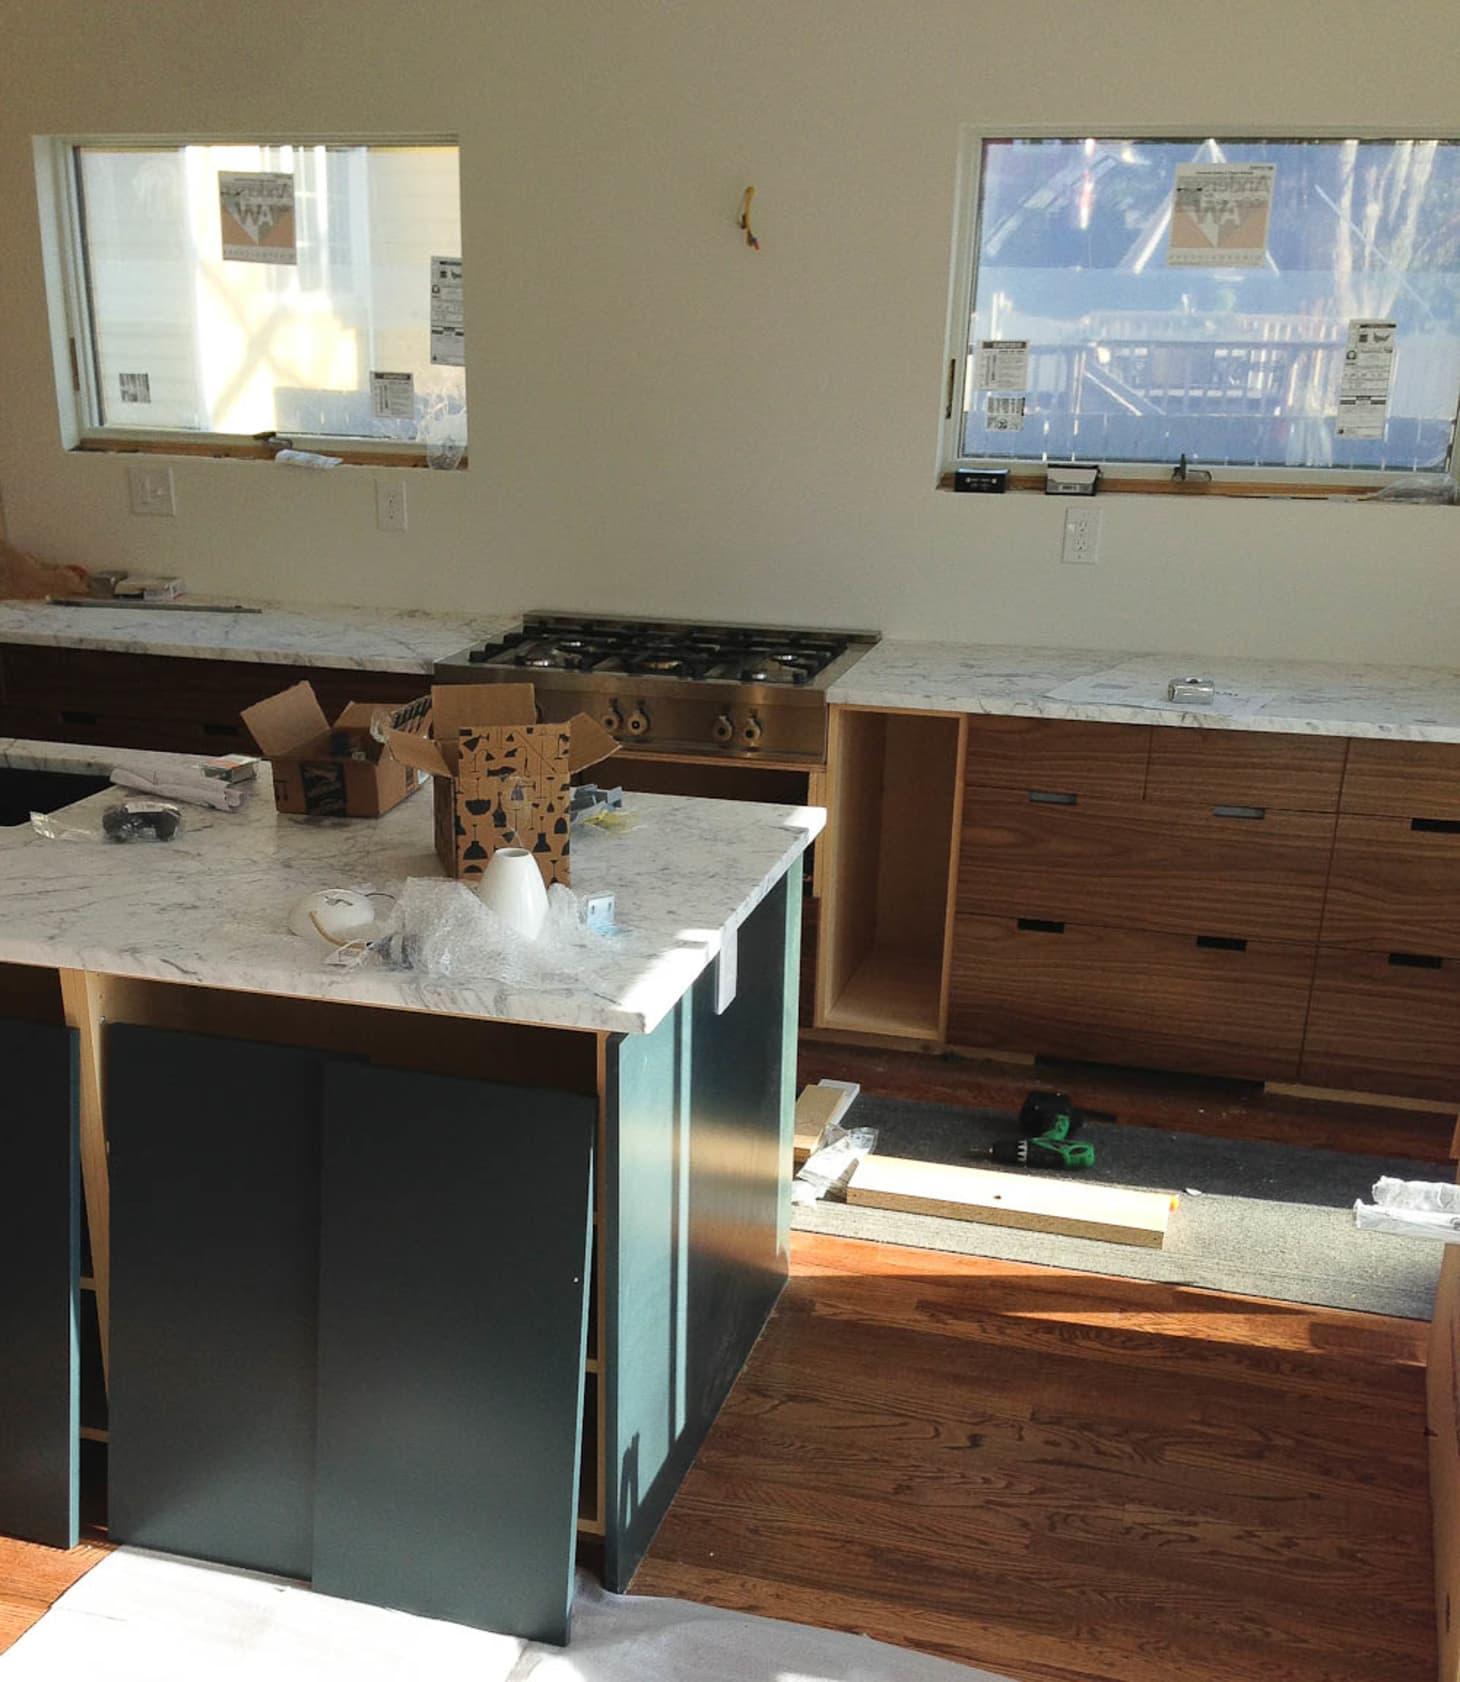 Faithu0027s Kitchen Renovation: How We Finally Got Our Carrara Marble  Countertops